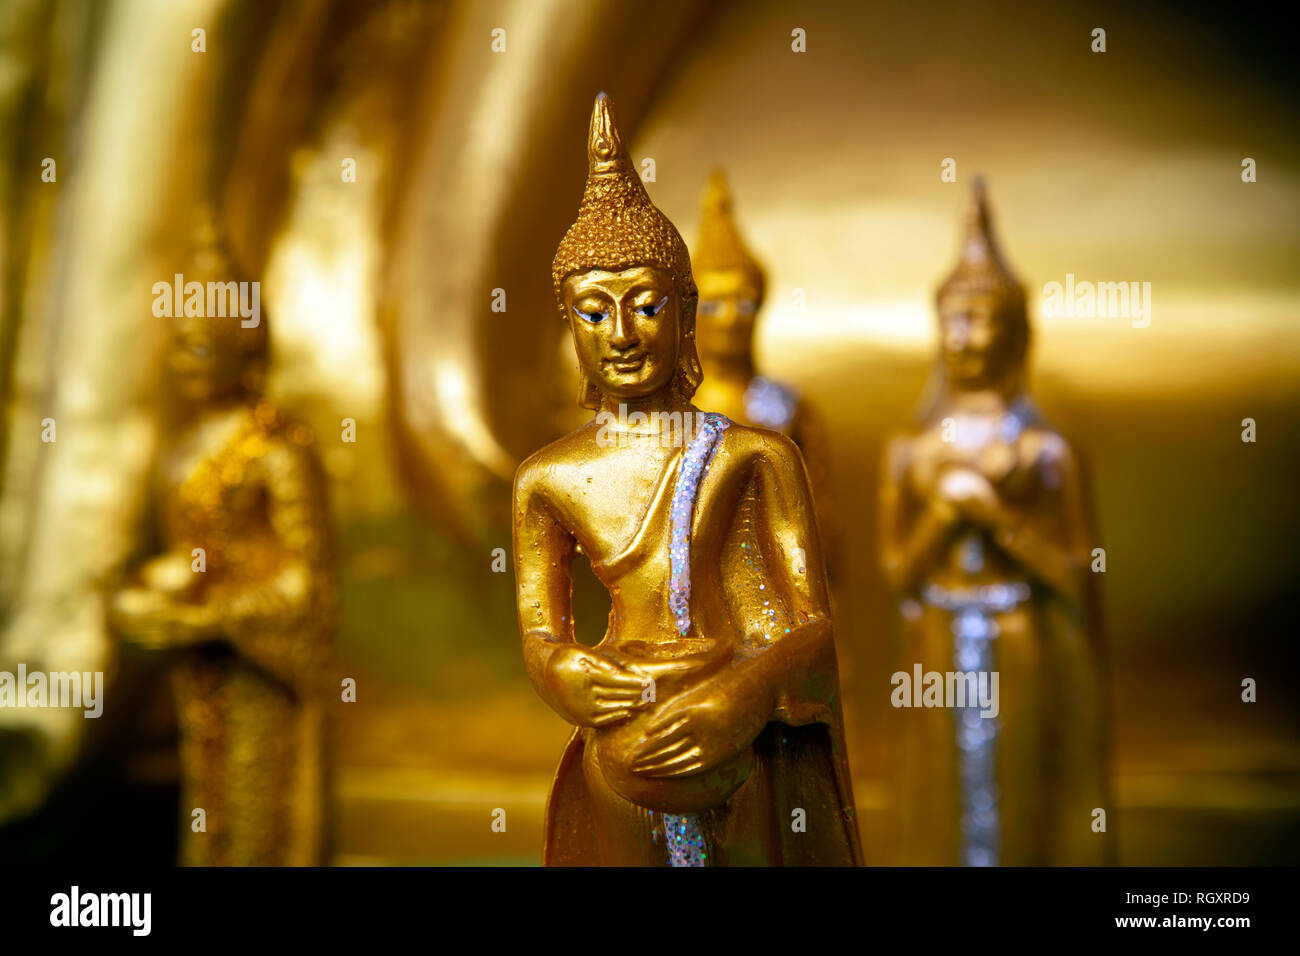 Closeup detail of small ornate gold buddha at Wat Phra Yai located on Pratumnak Hill in Pattaya, Chonburi, Thailand. - Stock Image